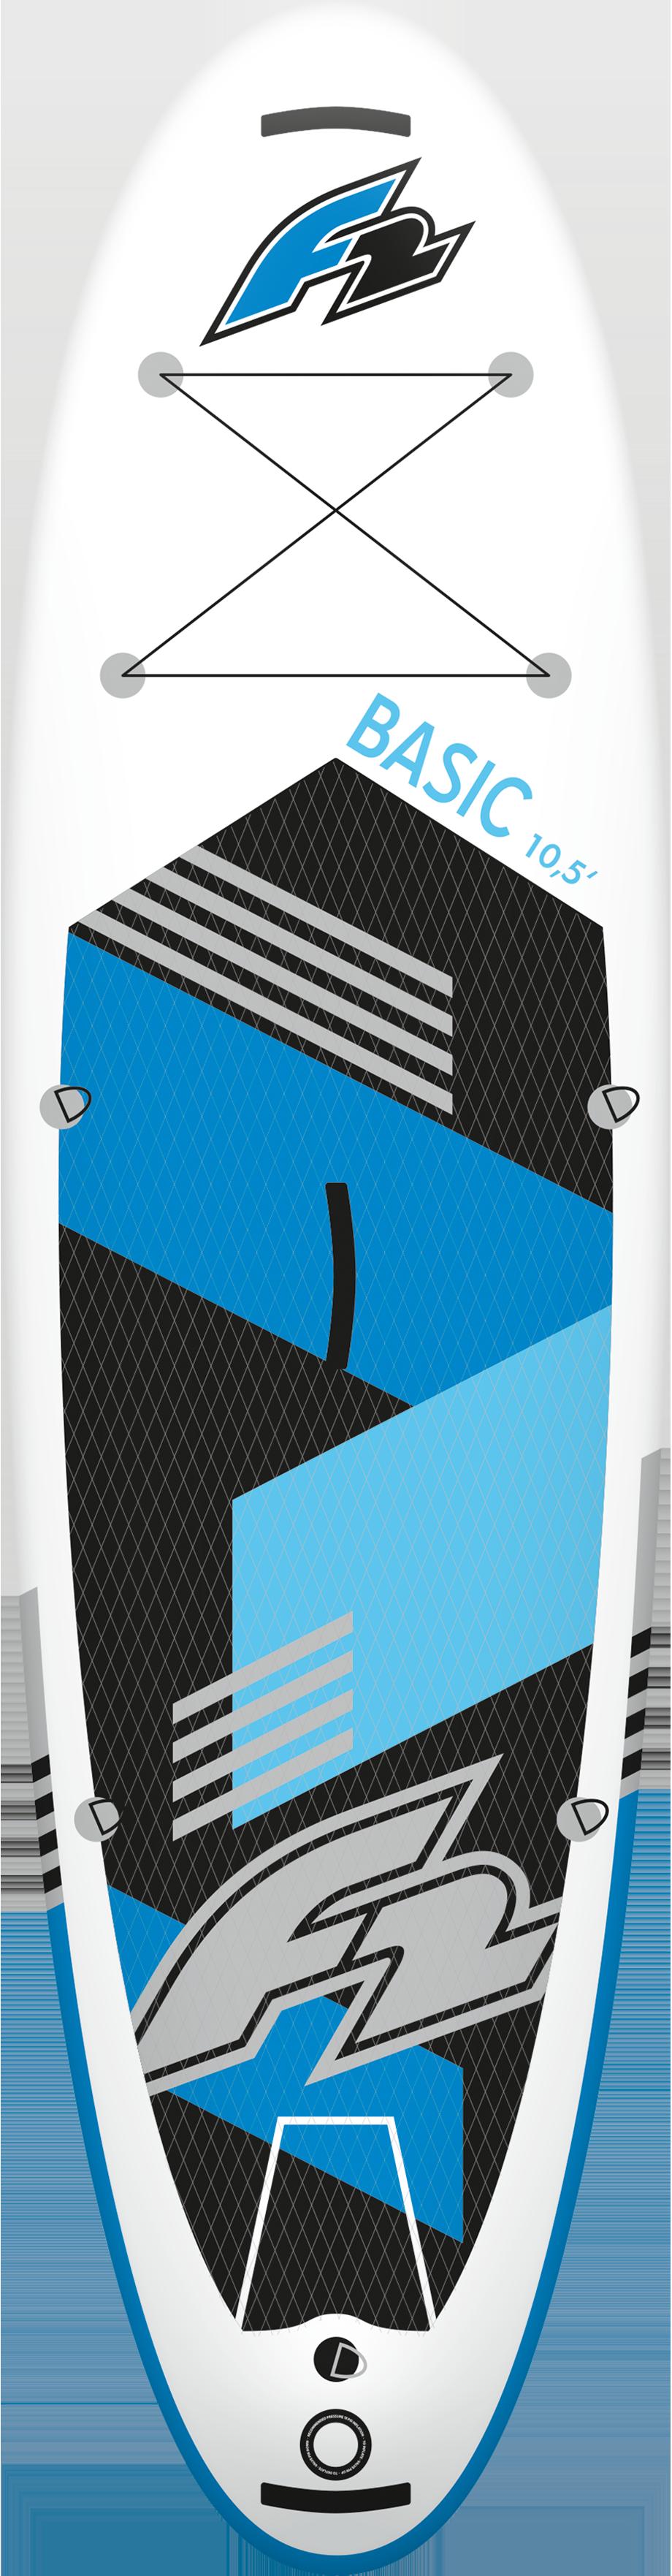 BASIC BLUE - Top